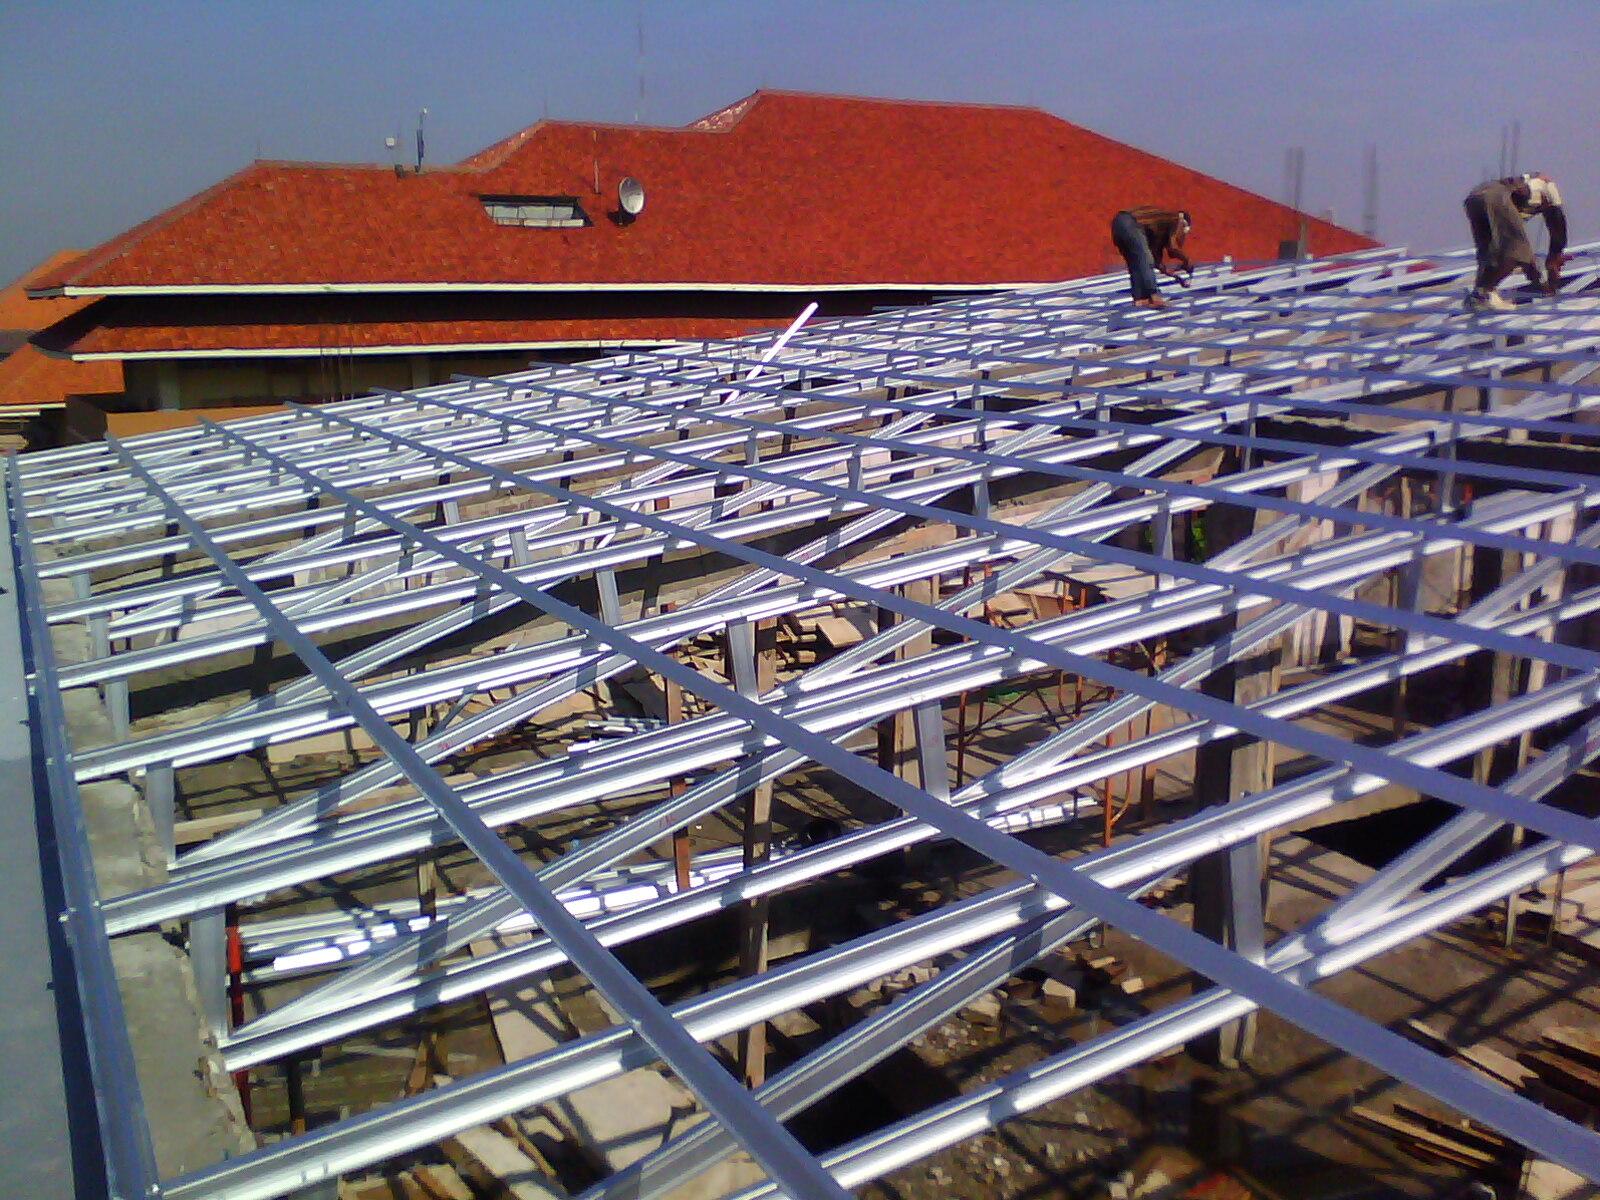 baja ringan liusen jual atap 0851 051 58 6 supplier